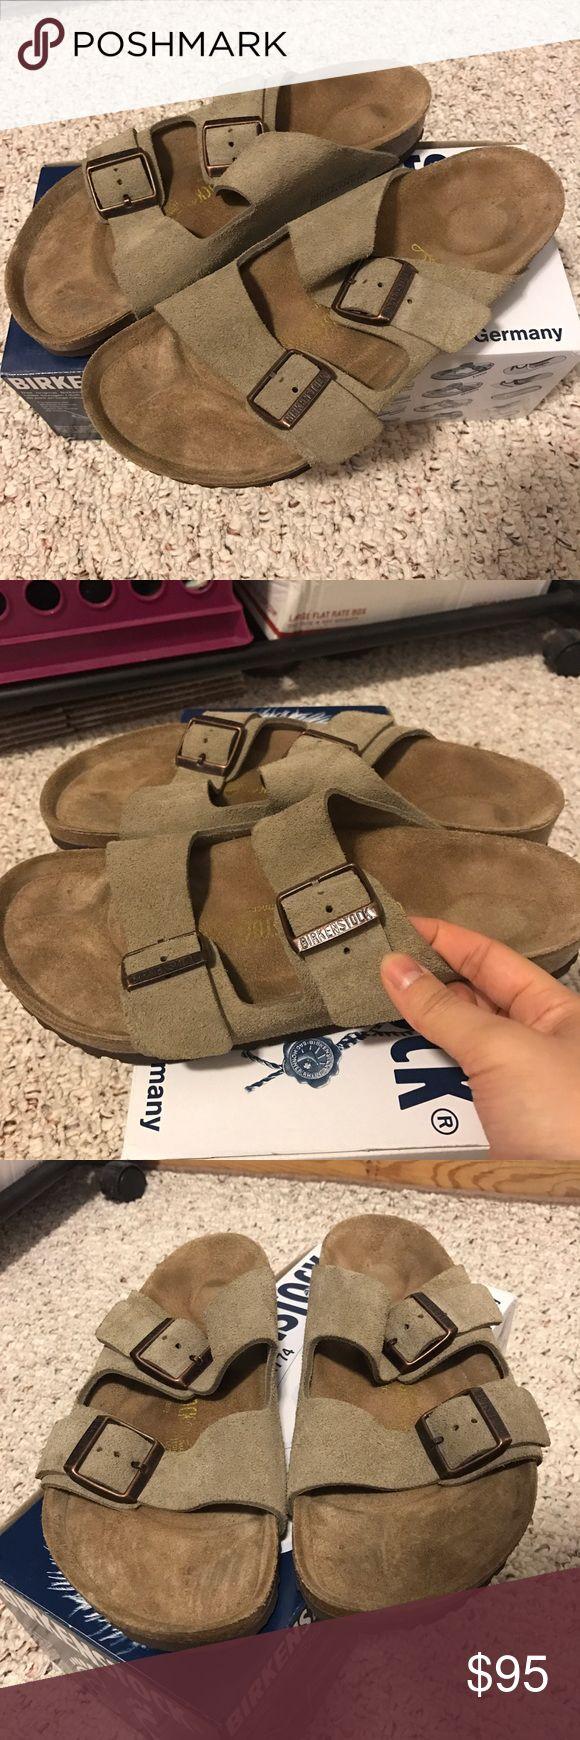 Birkenstock Arizona taupe Mint condition Birkenstock worn once. No footprints, no box included. Sz 40 Birkenstock Shoes Sandals